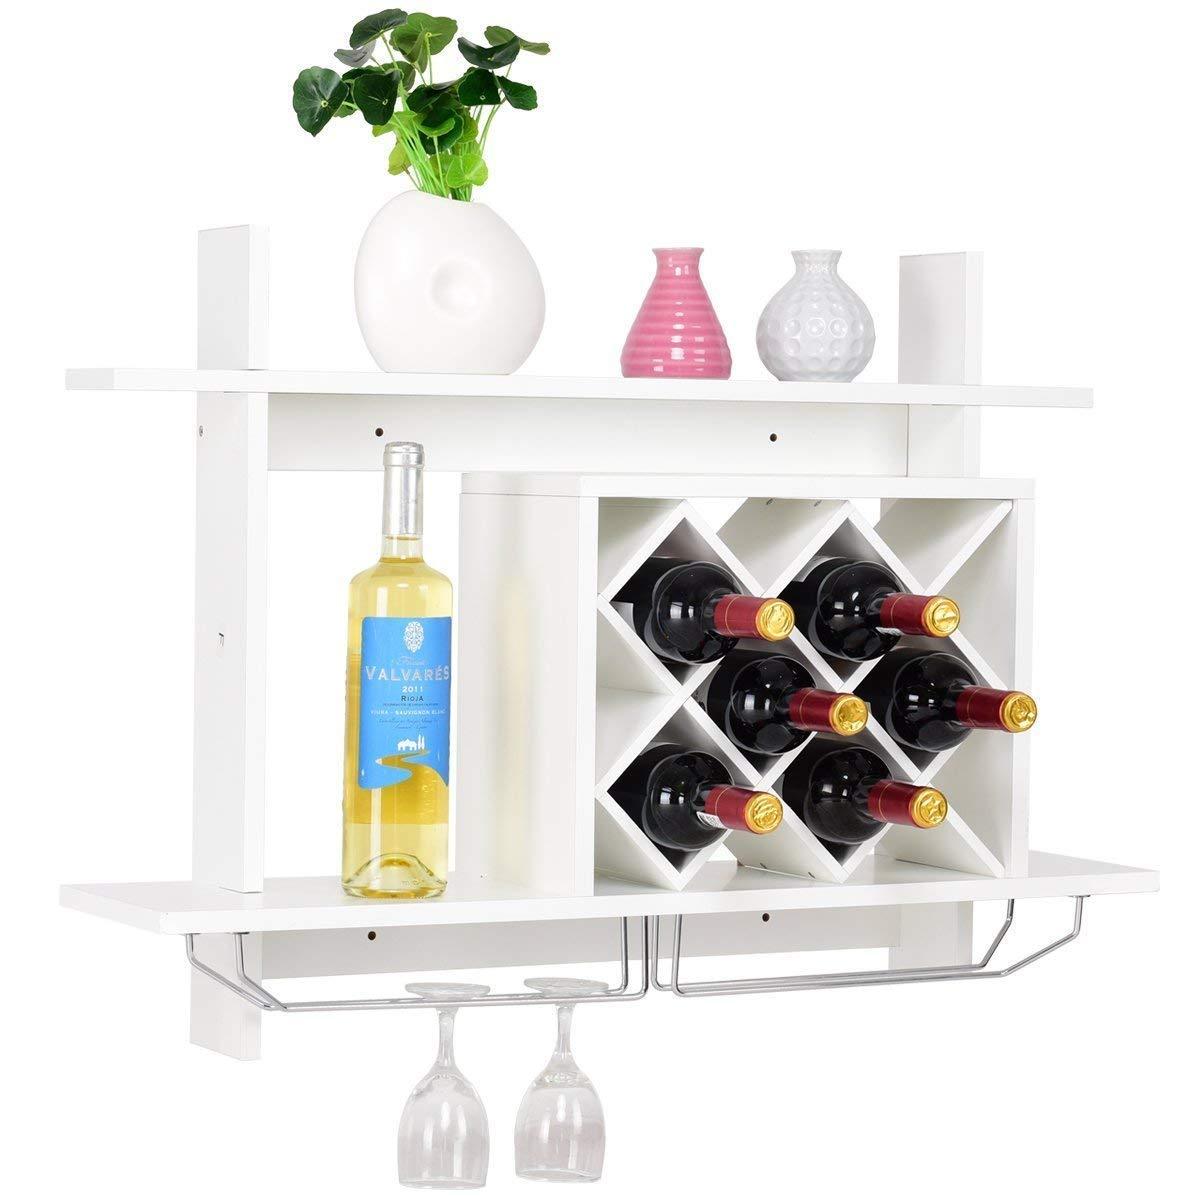 Giantex Wall Mounted Wine Rack Organizer W/Metal Glass Holder & Multifunctional Storage Shelf Modern Diamond-Shaped Wood Wine Server for 10 Bottles Wine Storage Display Rack (Black Walnut) HW57400BK